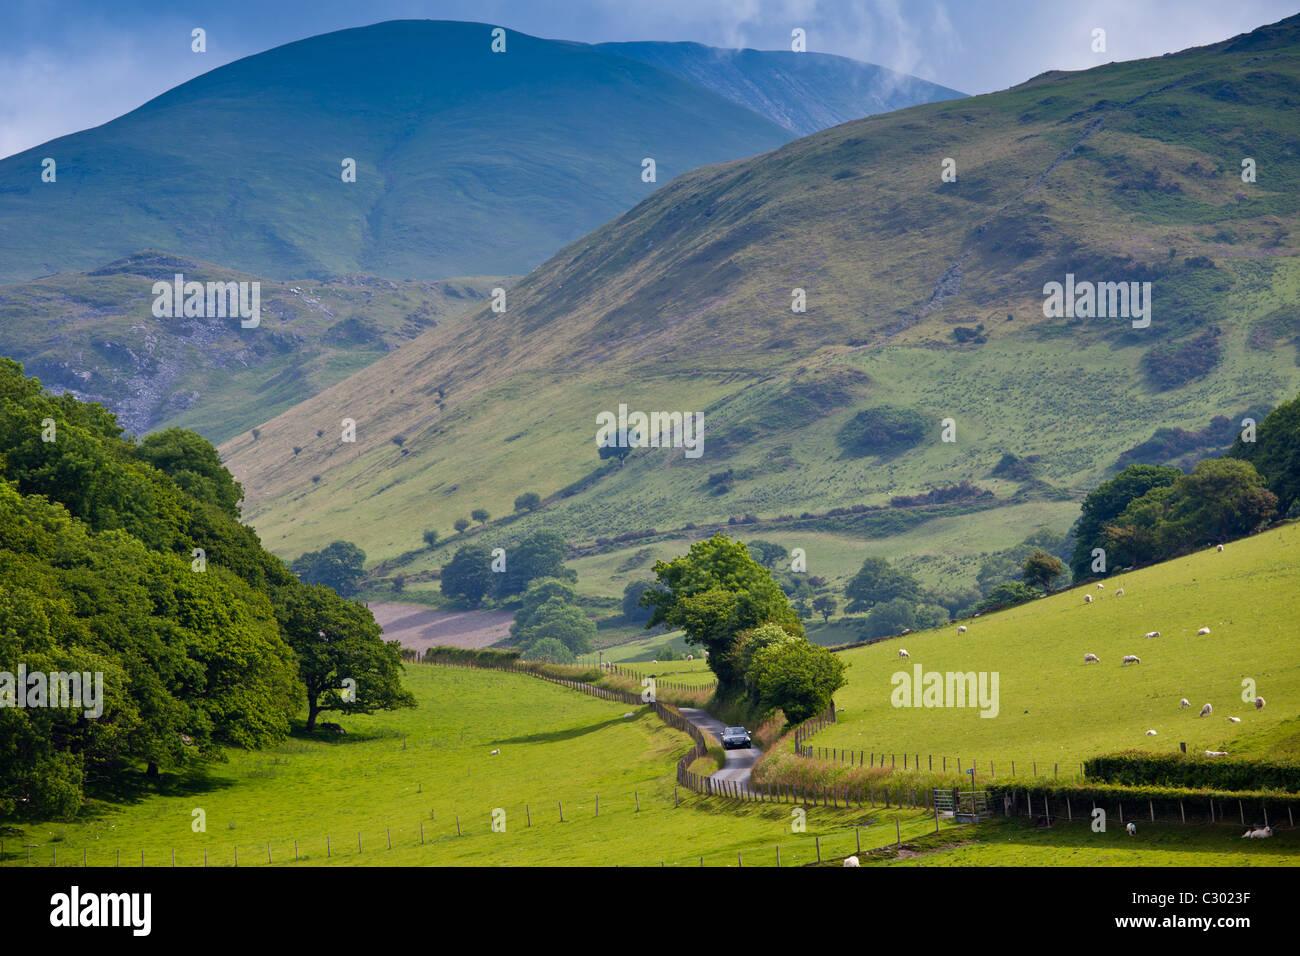 Car motoring along winding road through picturesque valley at Llanfihangel, Snowdonia, Gwynedd, Wales - Stock Image